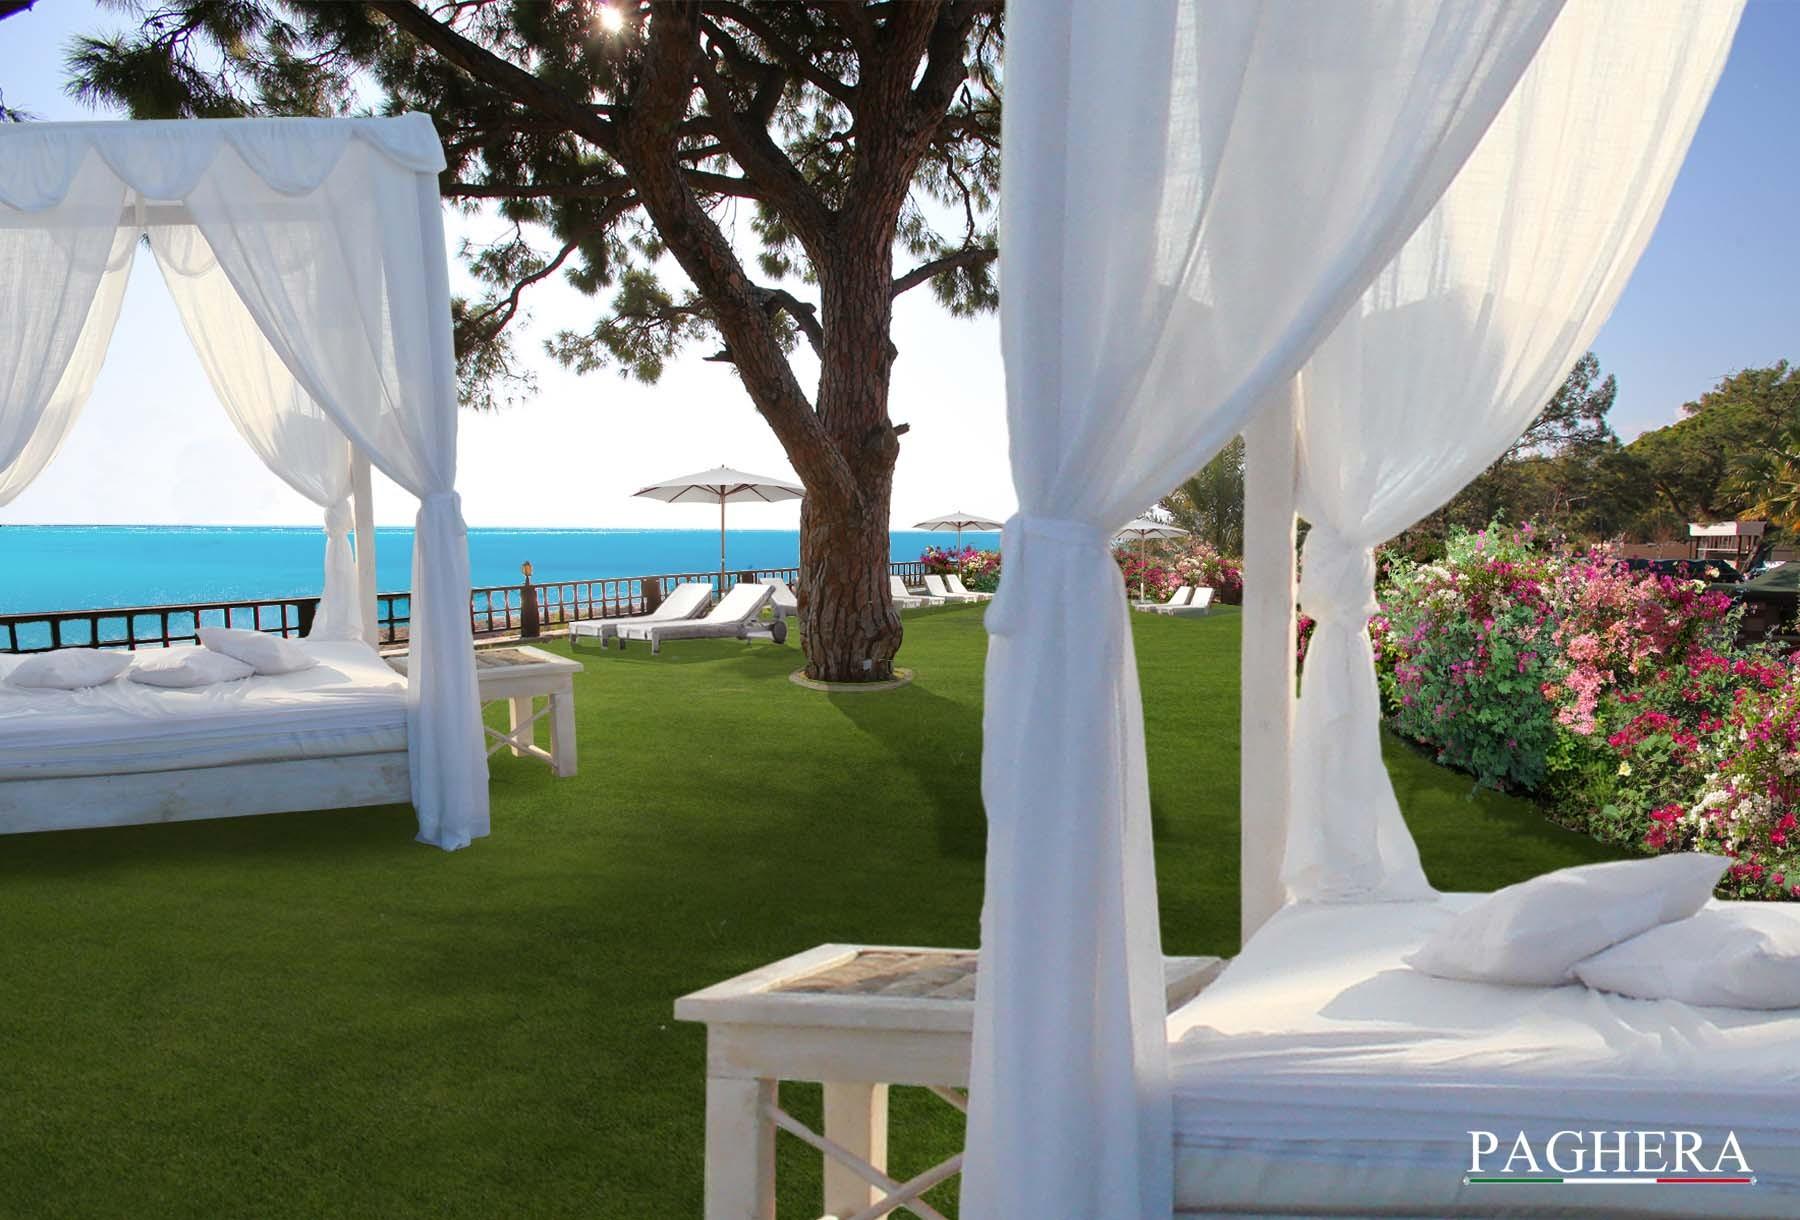 Rixos Premium Hotel Tekirova - Antalya Turkey - Turistico Residenziale